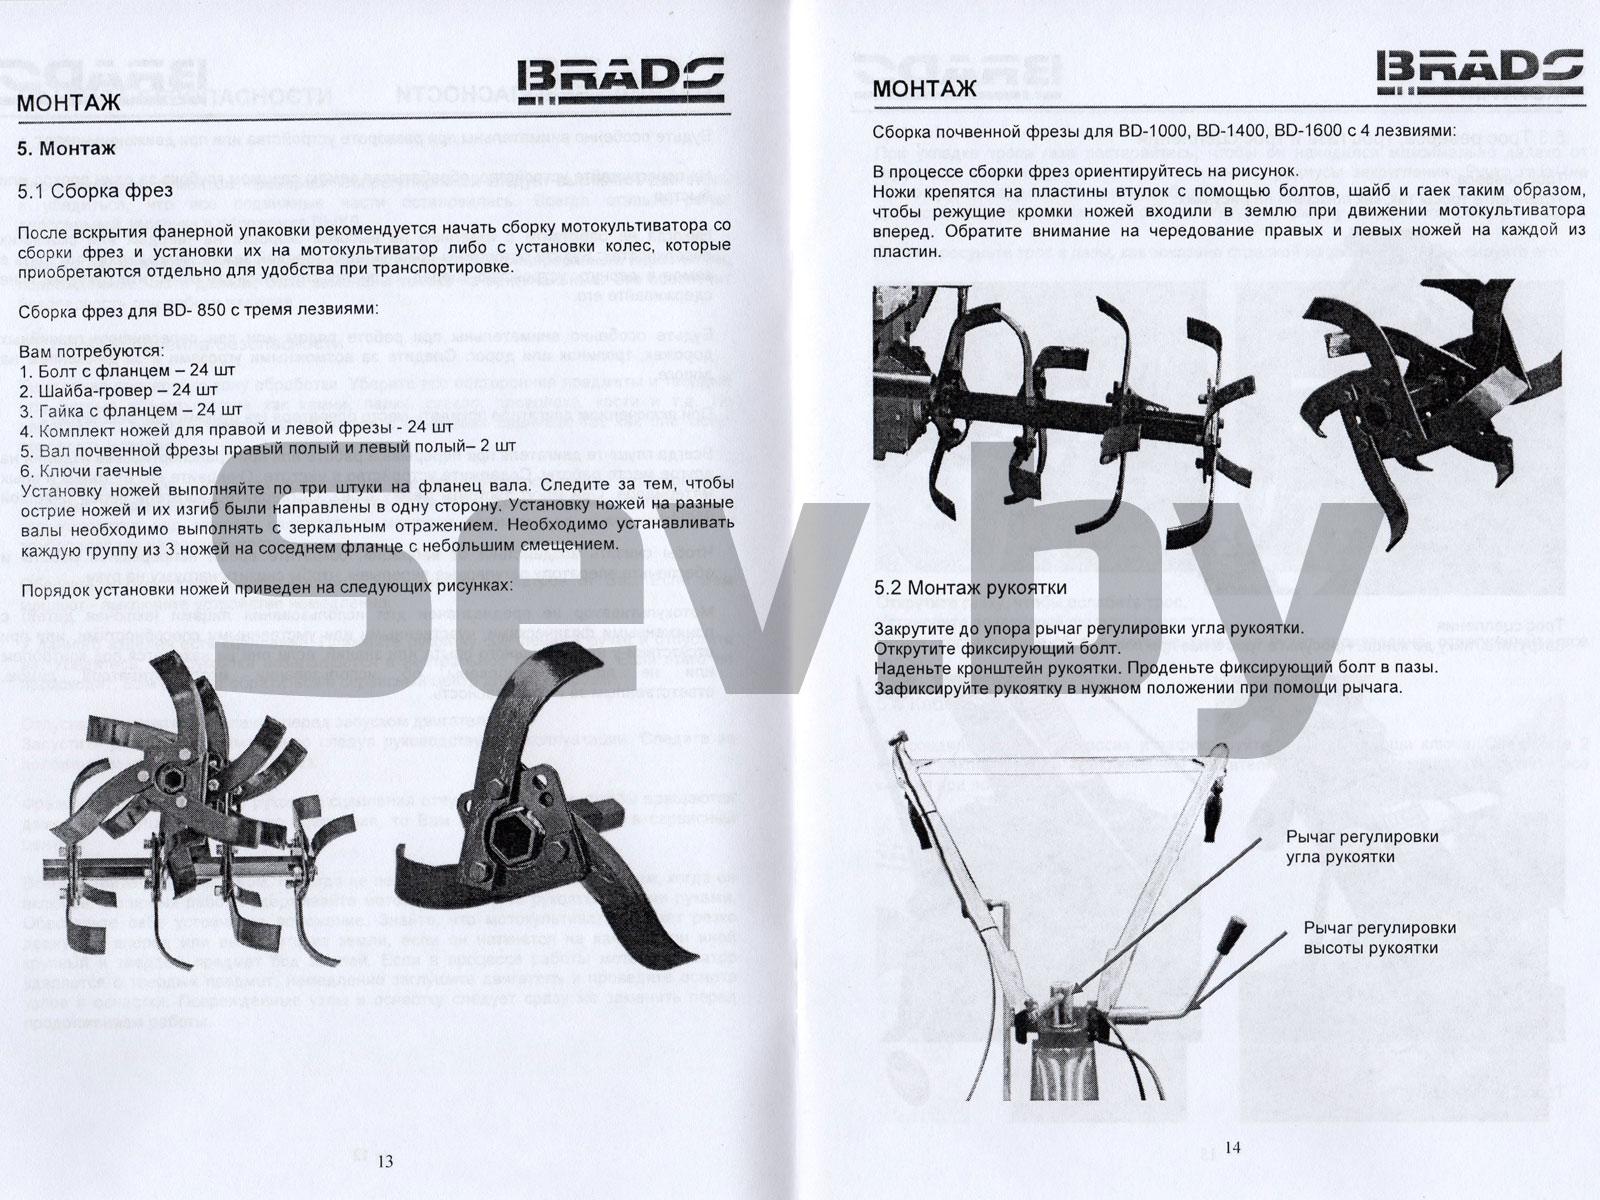 Сборка фрез мотоблока Brado BD-850. Руководство по эксплуатации.